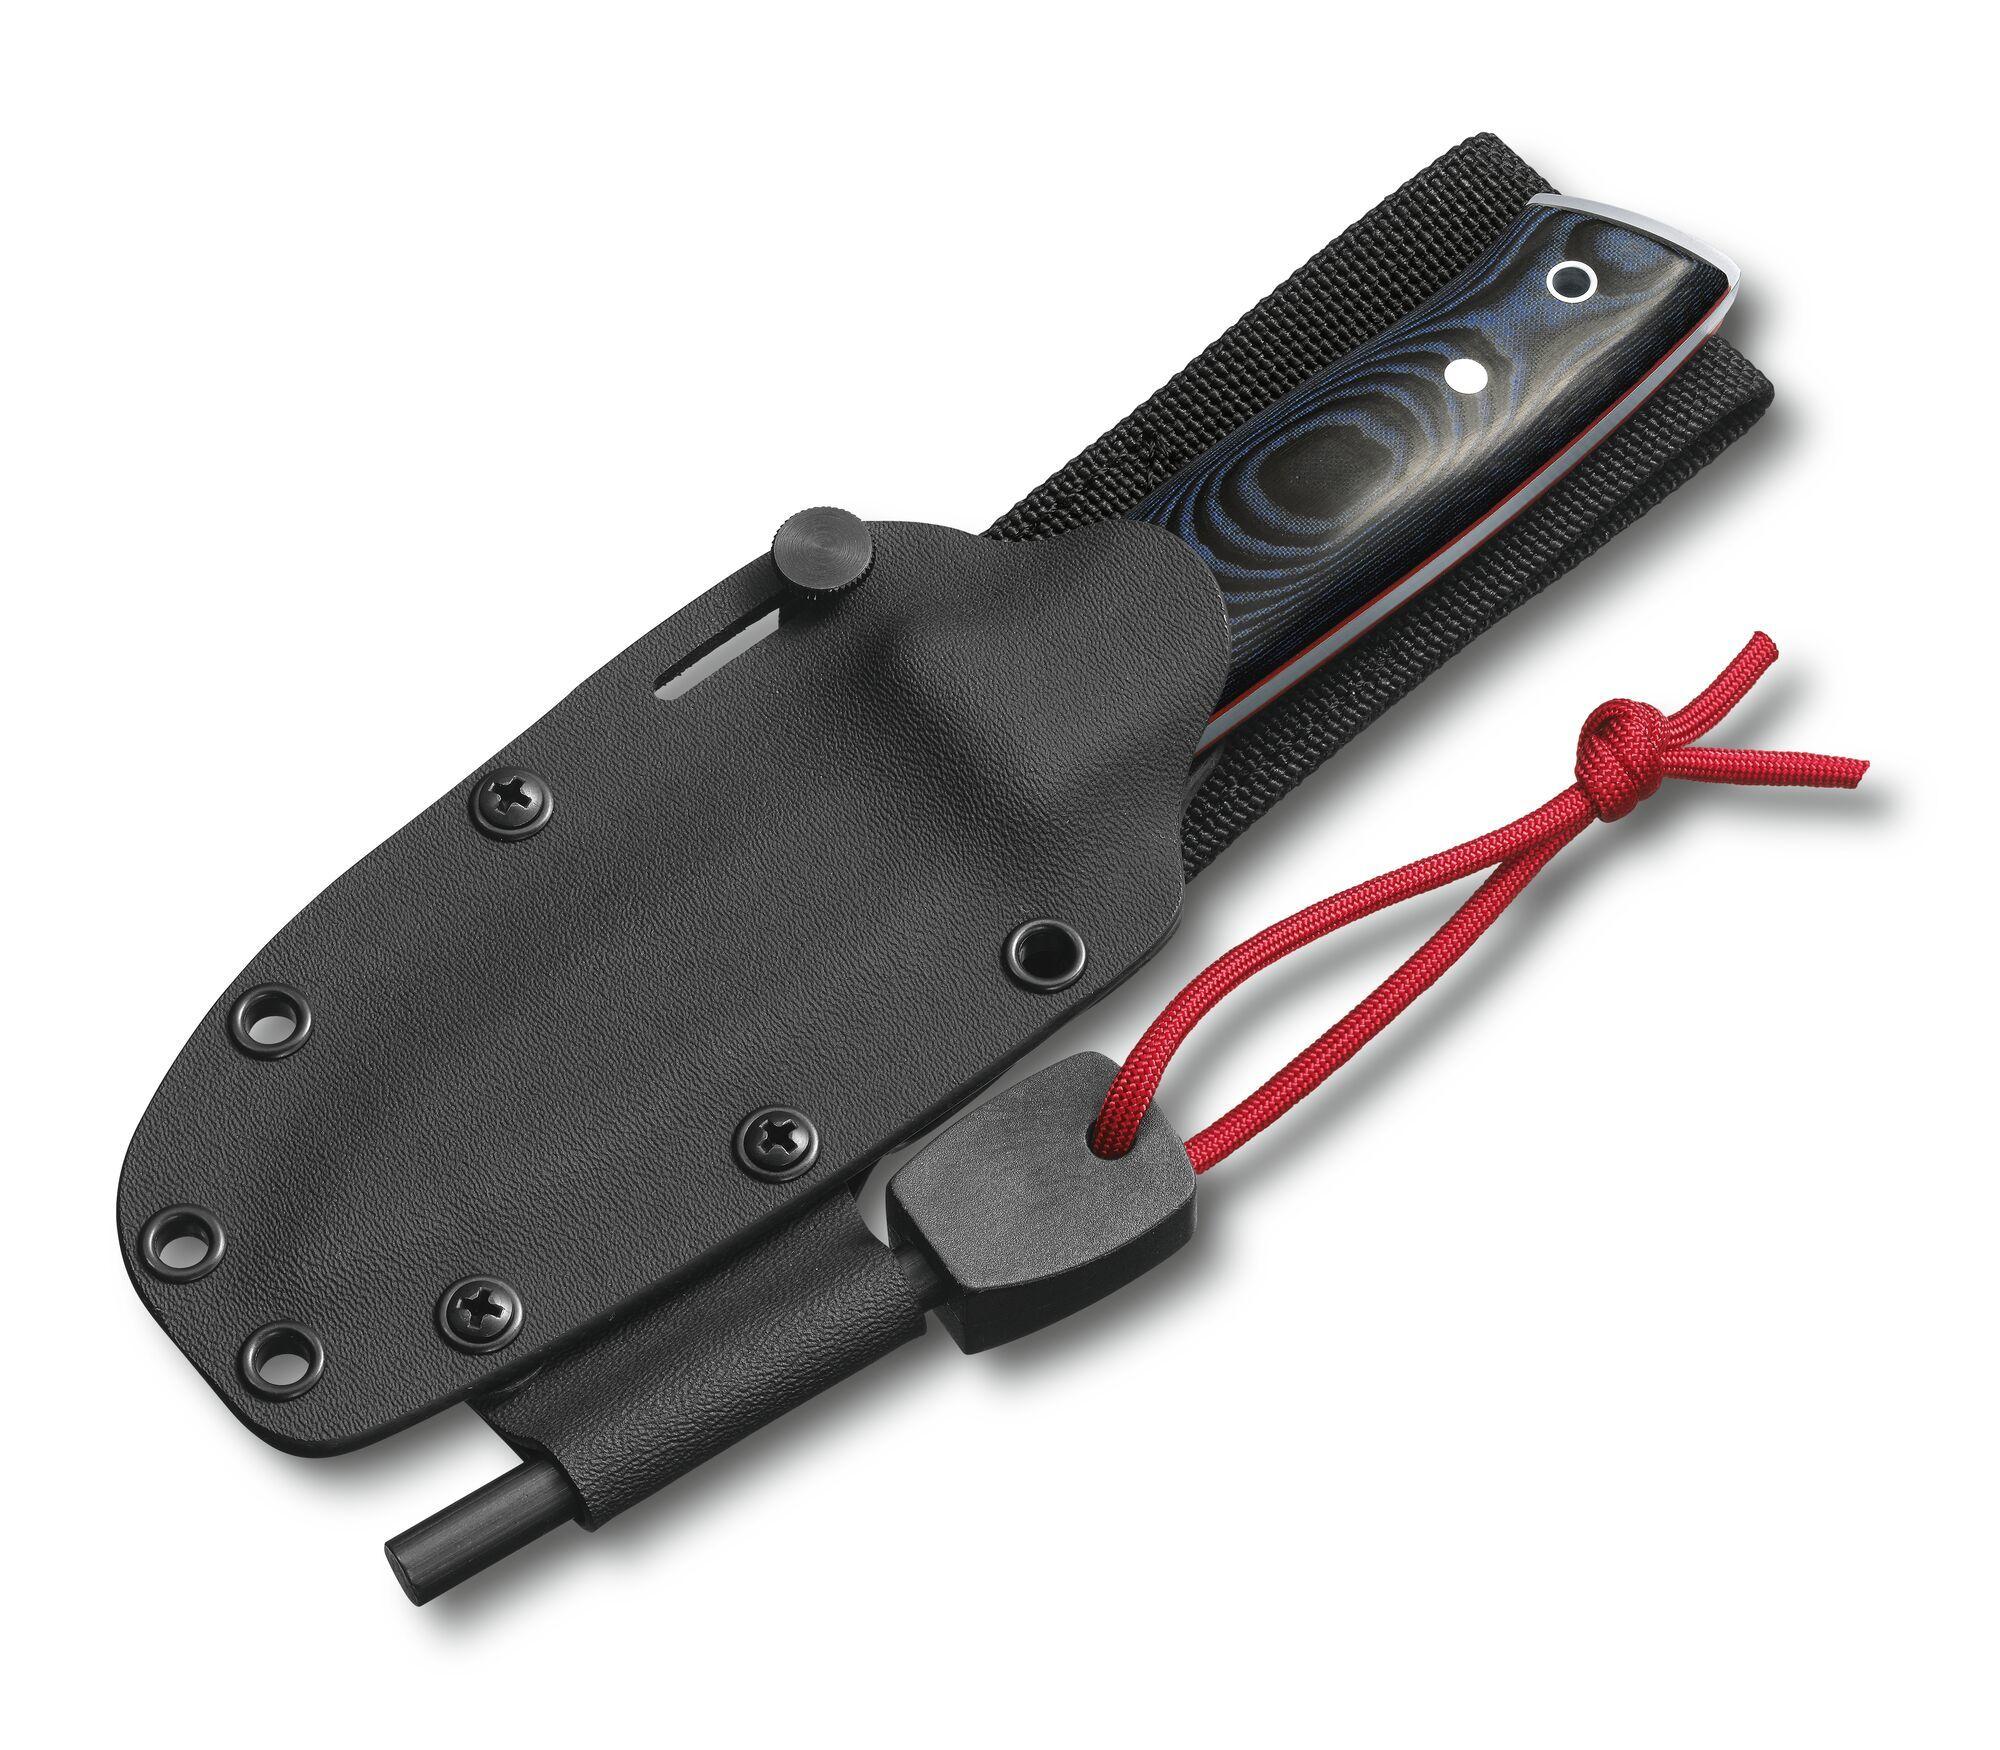 Нож с фиксированным клинком Victorinox Outdoor Master Mic размер L (4.2261) - Wenger-Victorinox.Ru